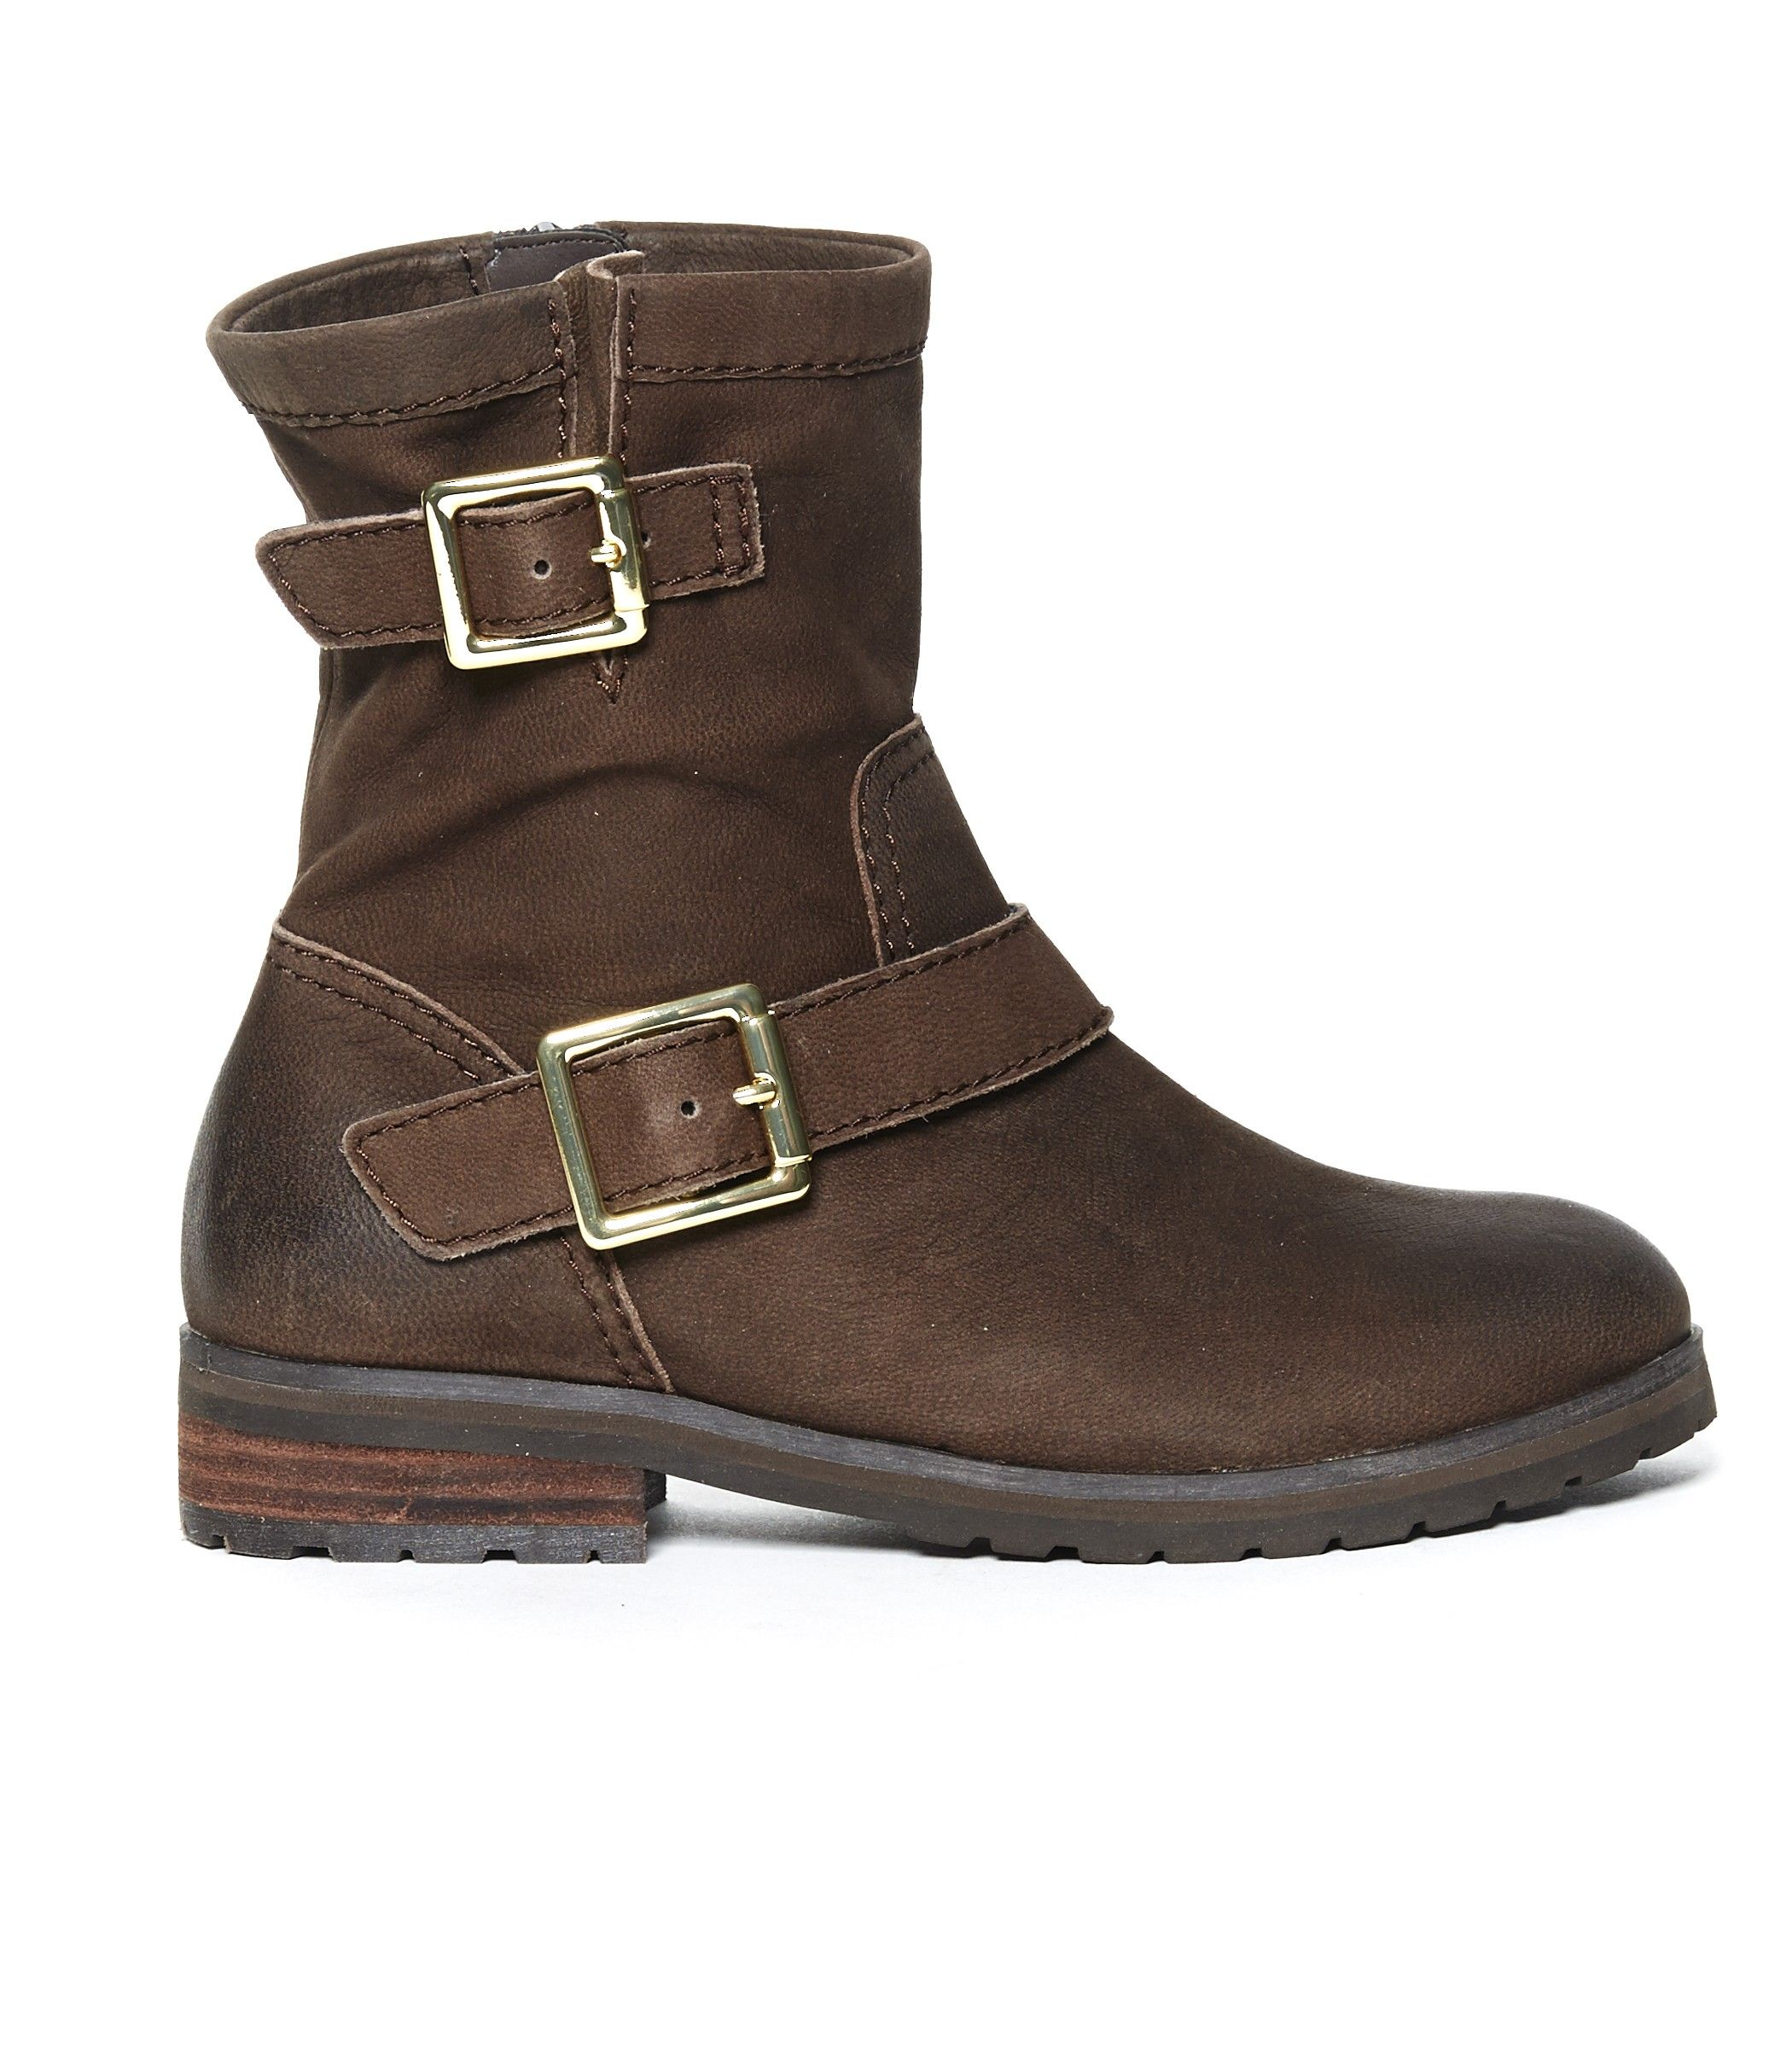 50+ Cute boots for girls ideas ideas